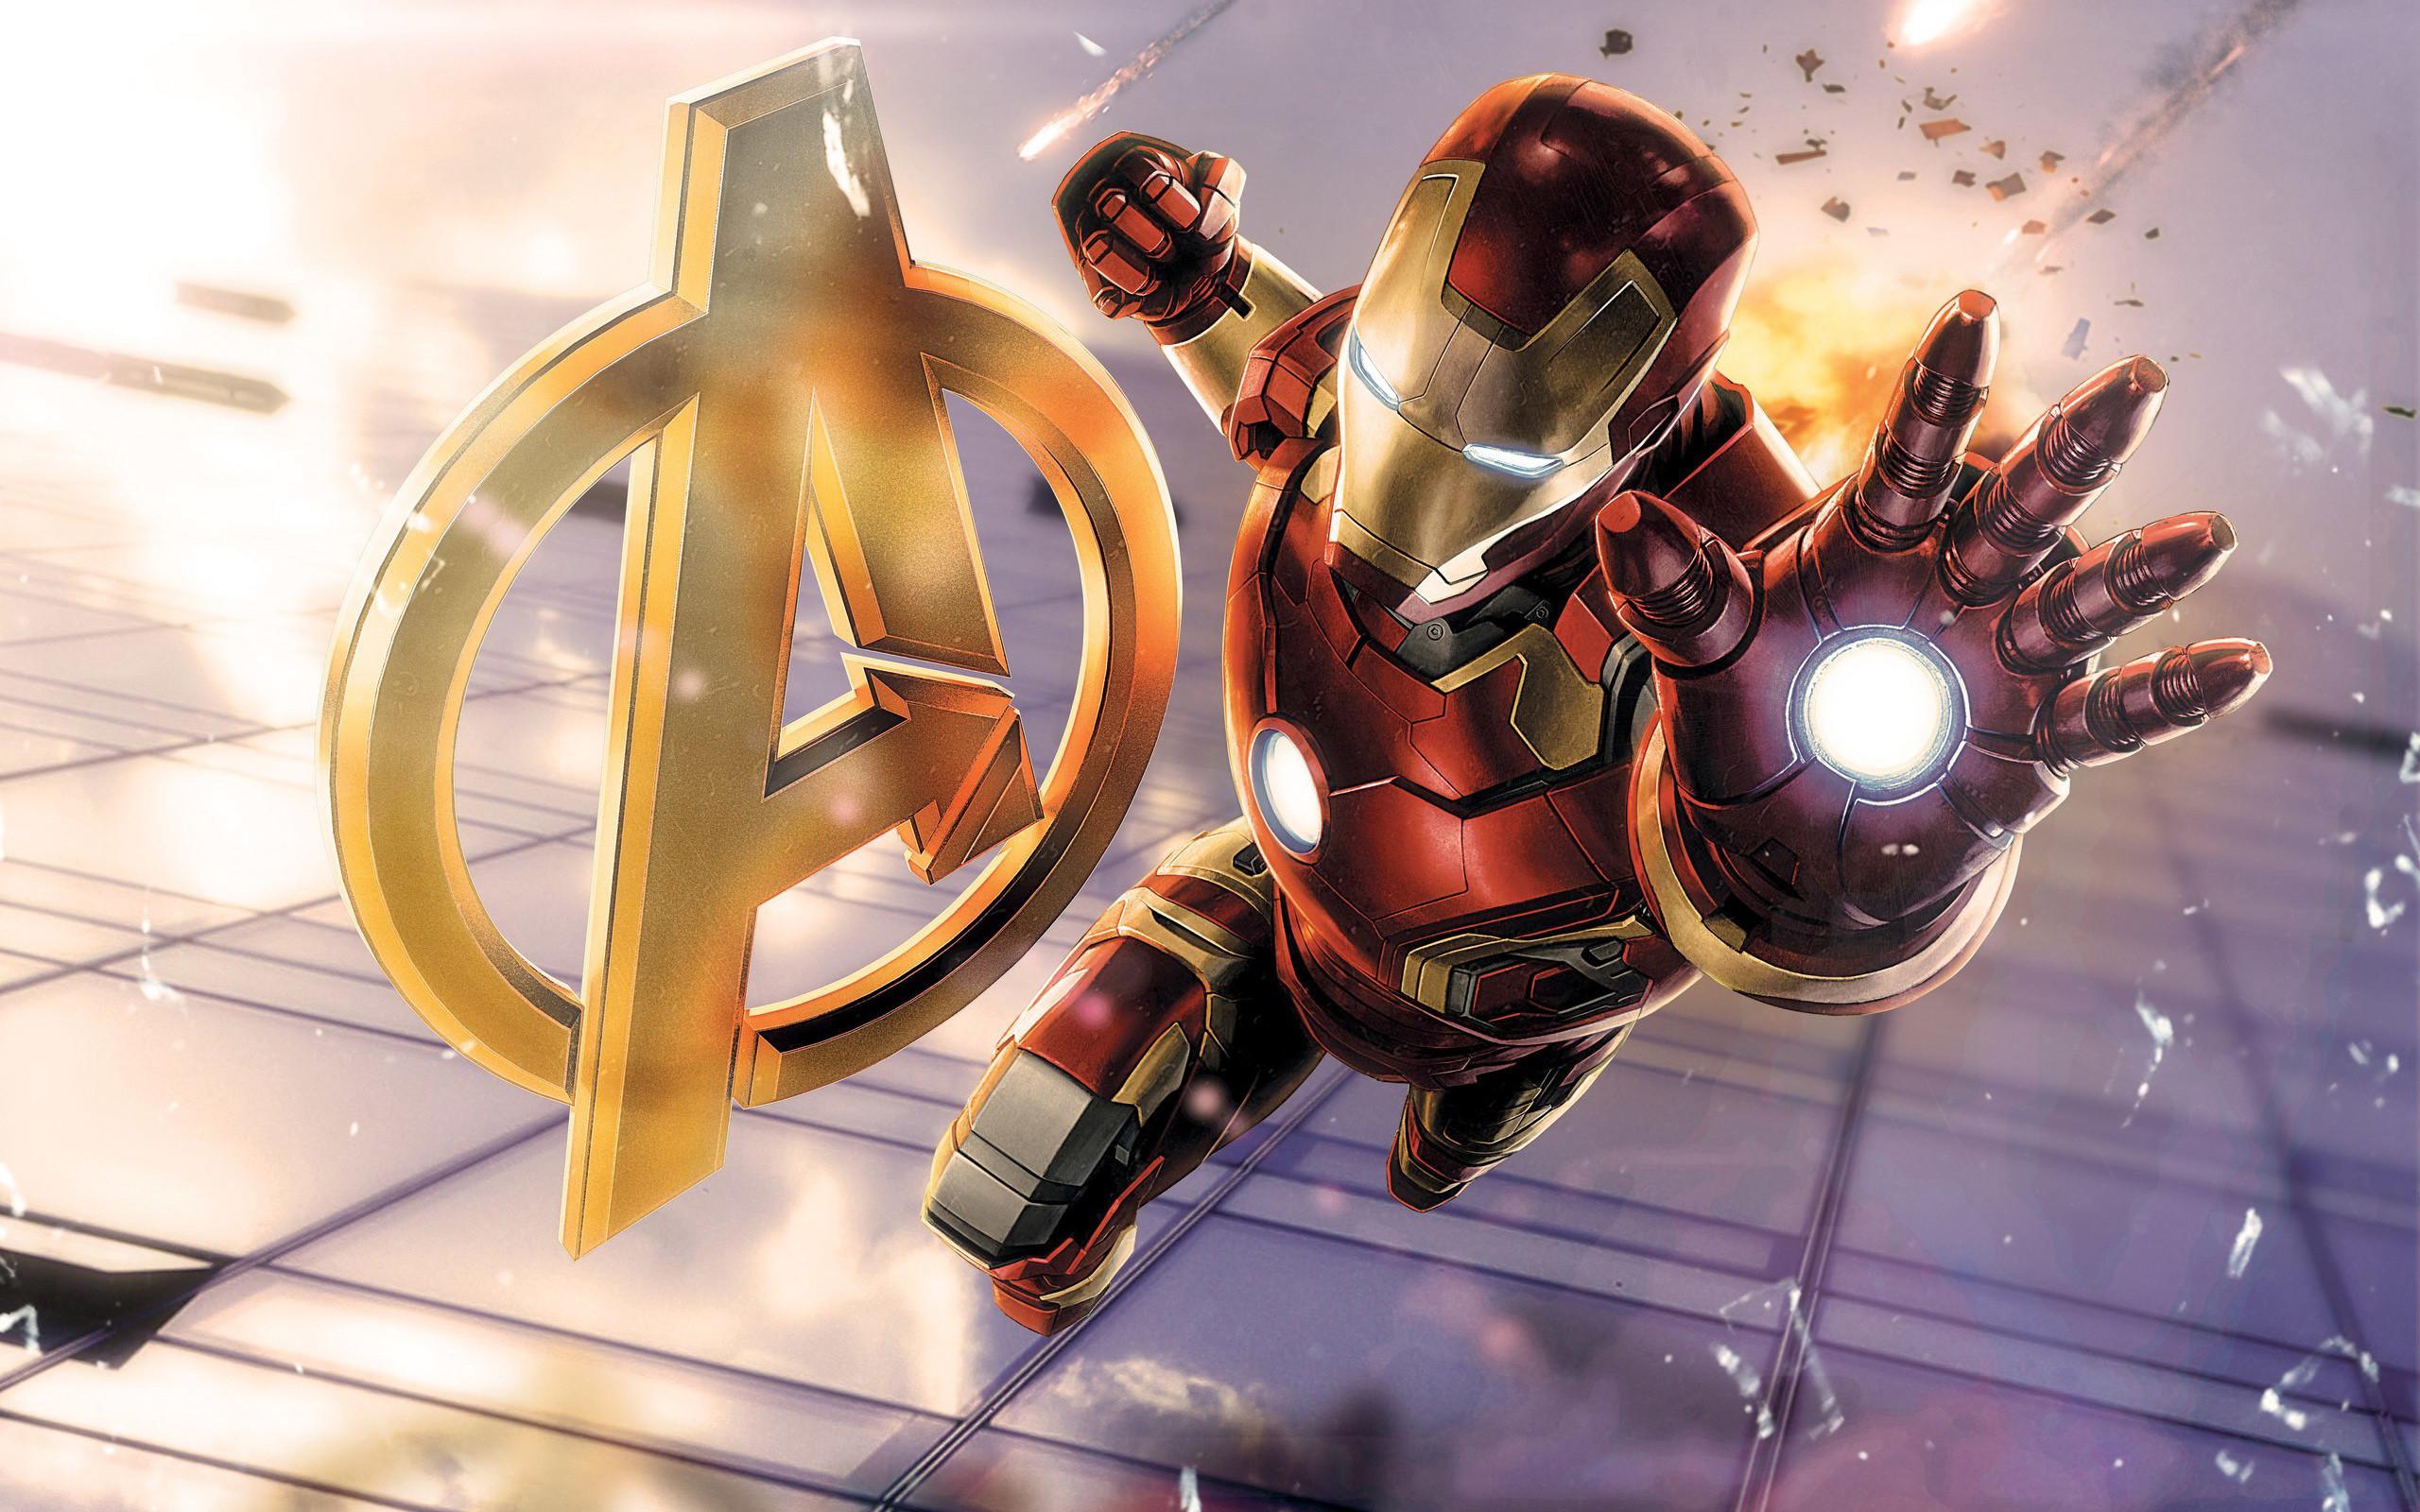 Avengers Wallpapers HD Wallpaper | HD Wallpapers | Pinterest | Avengers  wallpaper and Wallpaper